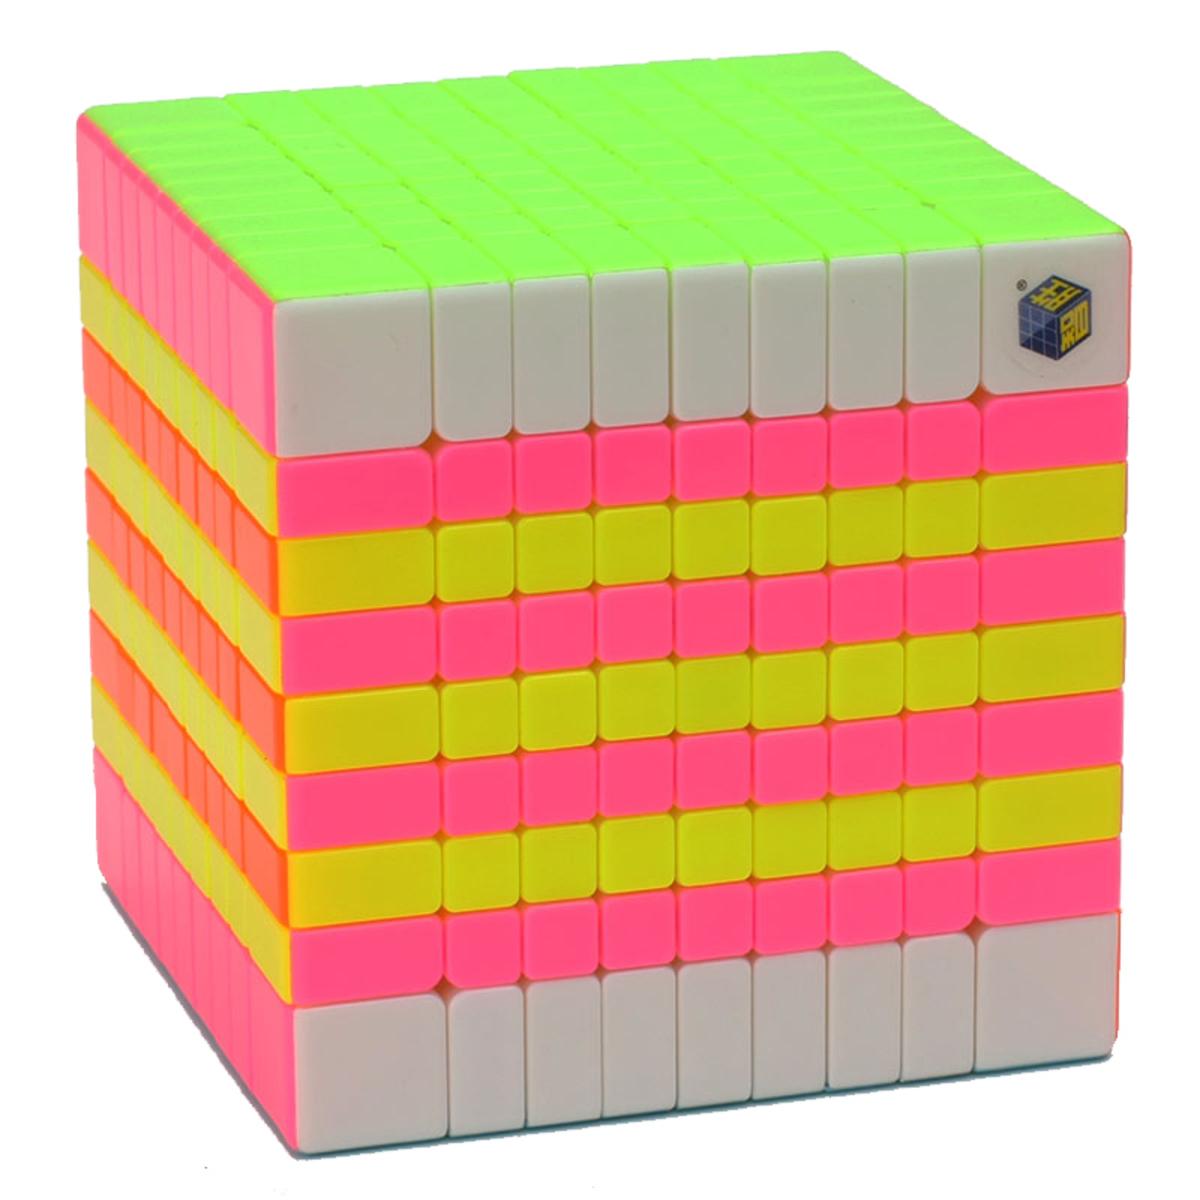 9x9x9 Yuxin Stickerless